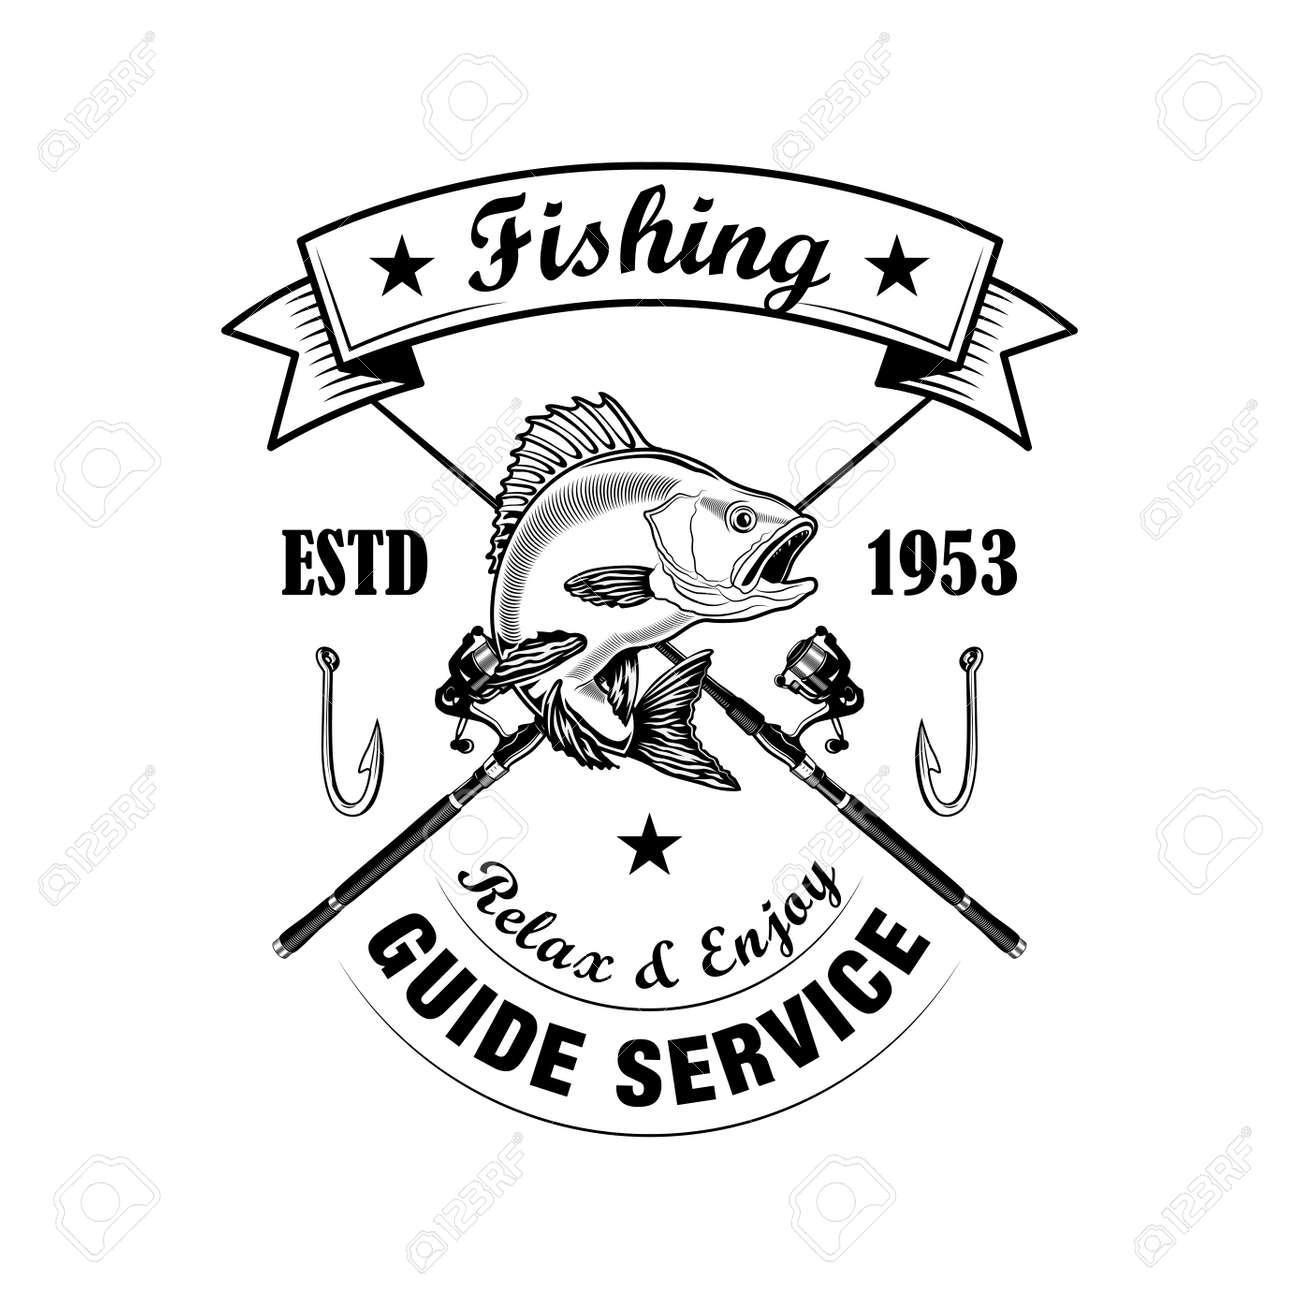 Fishing tools vector illustration - 158919769